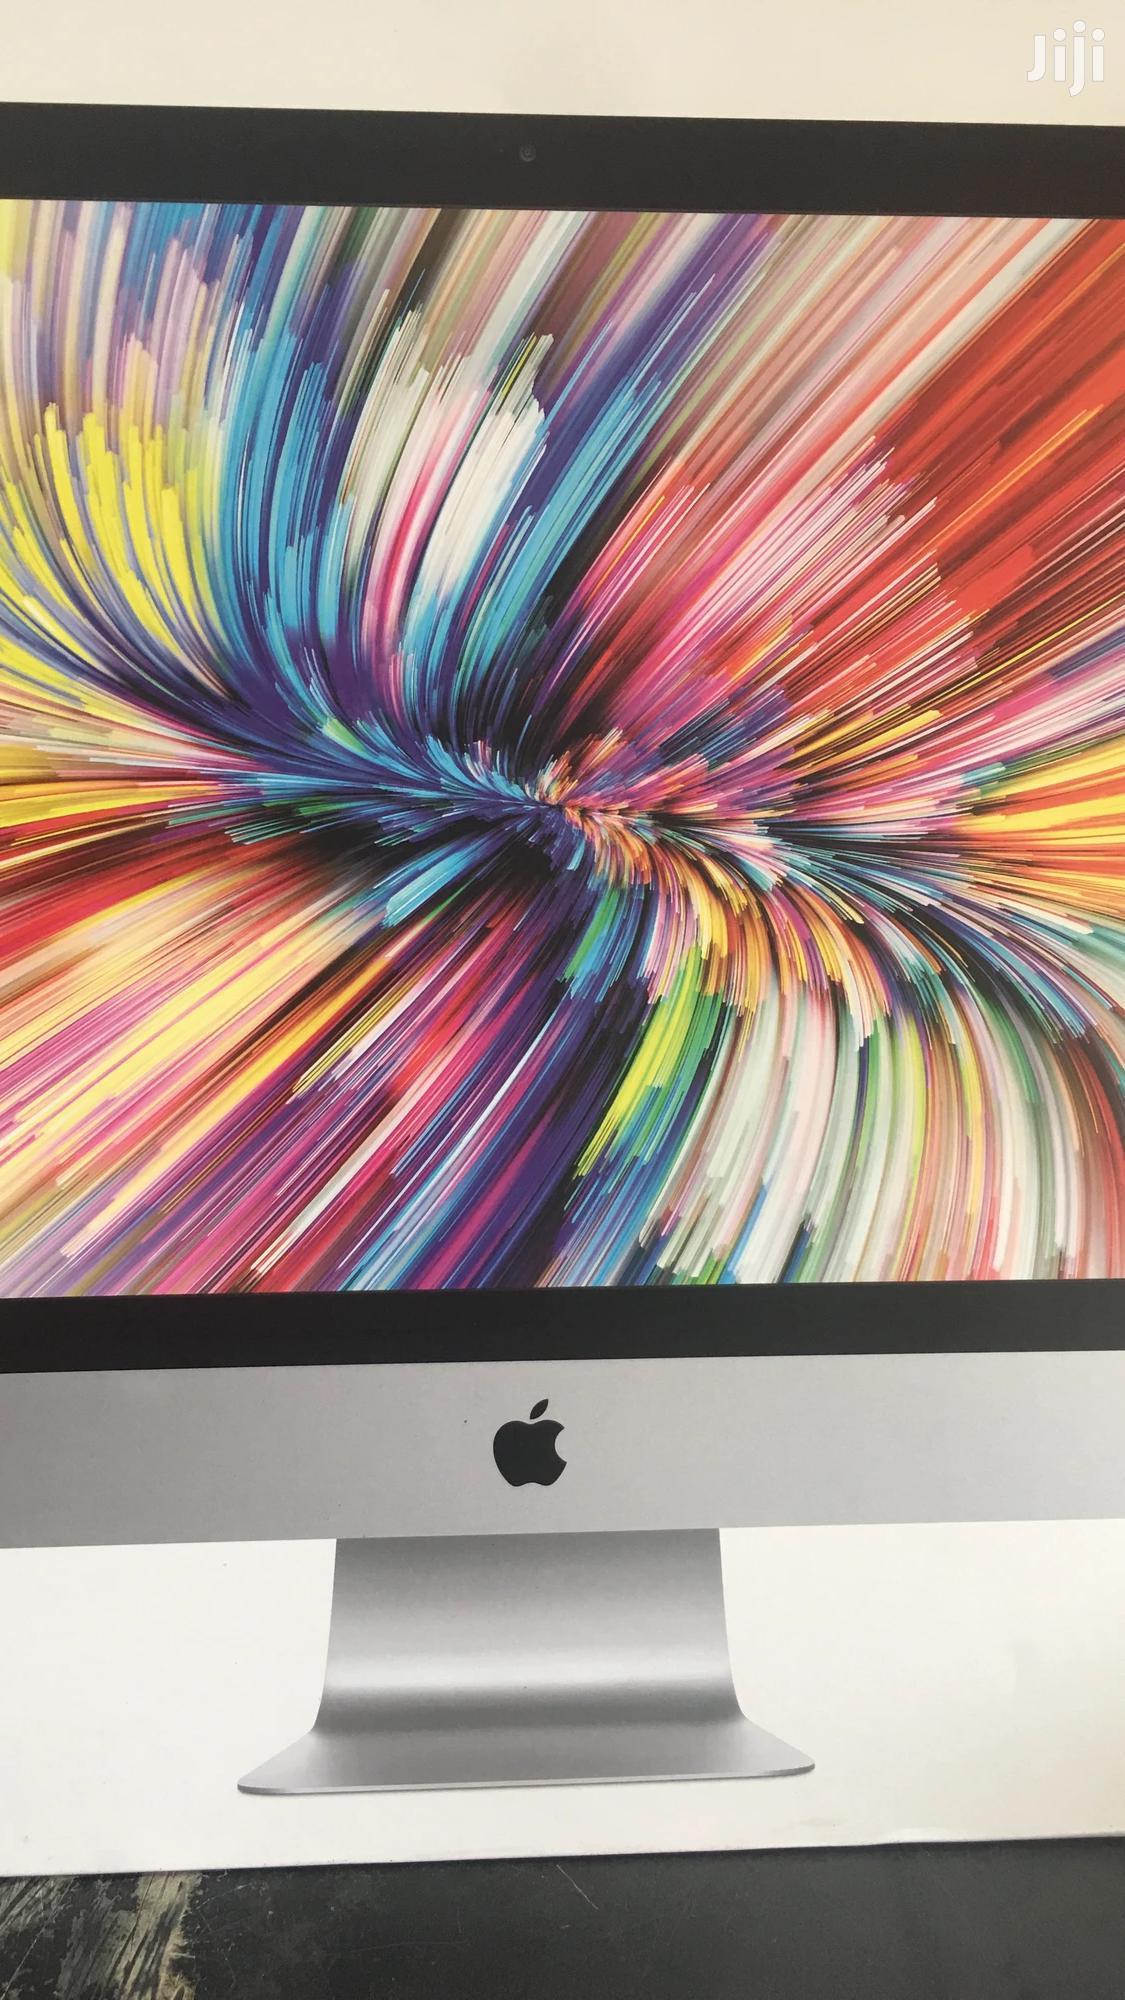 Archive: New Desktop Computer Apple iMac 8GB Intel Core i5 HDD 2T